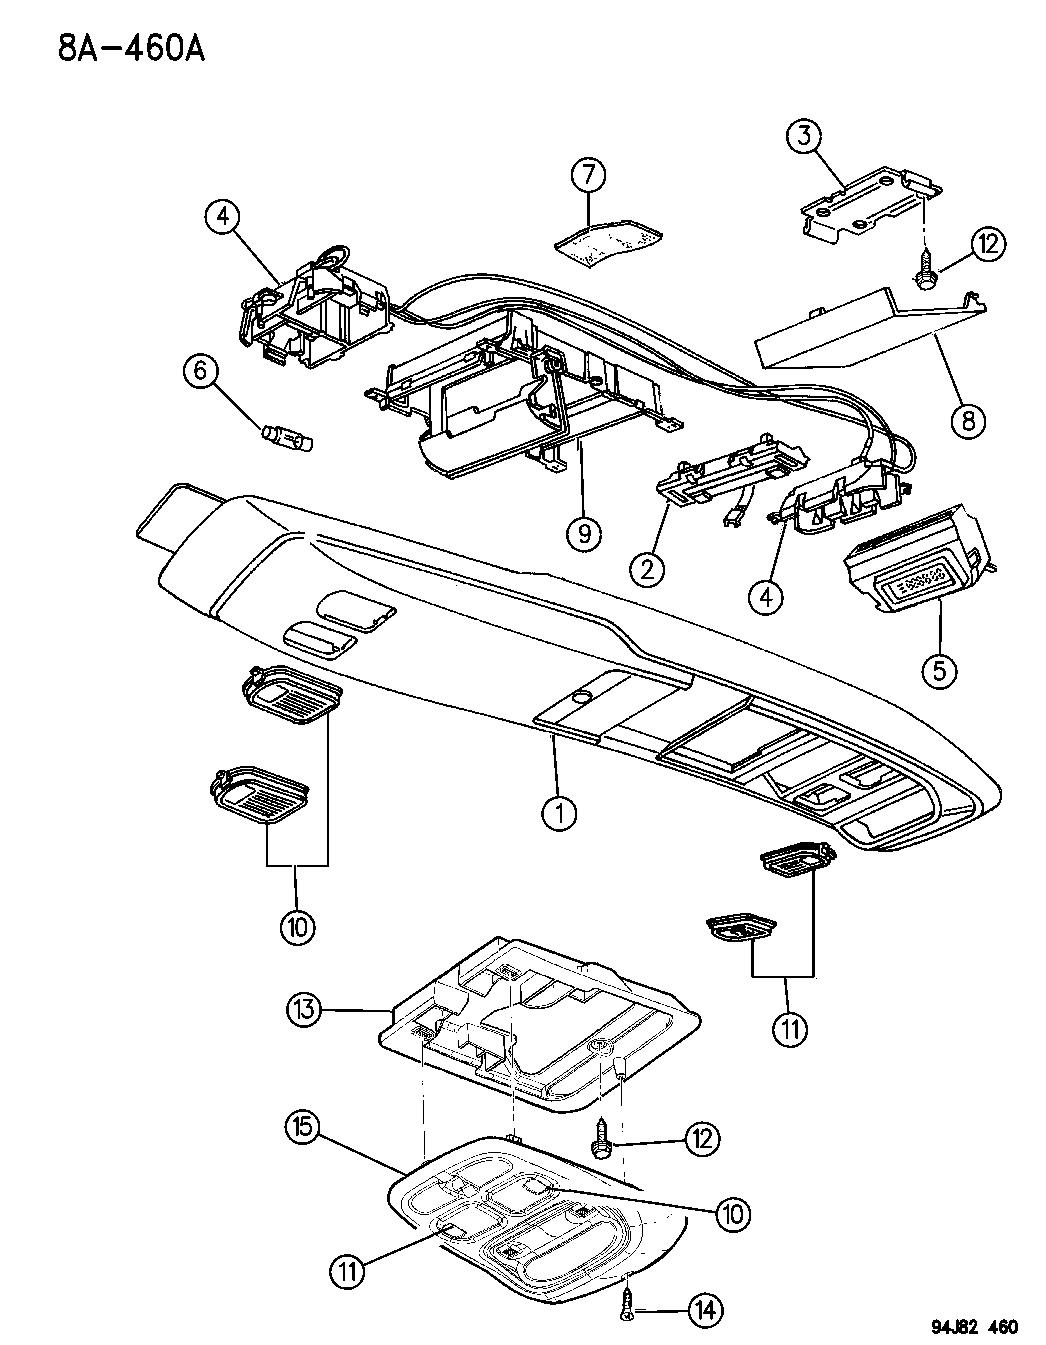 1996 Jeep Cherokee Tail Light Wiring Diagram